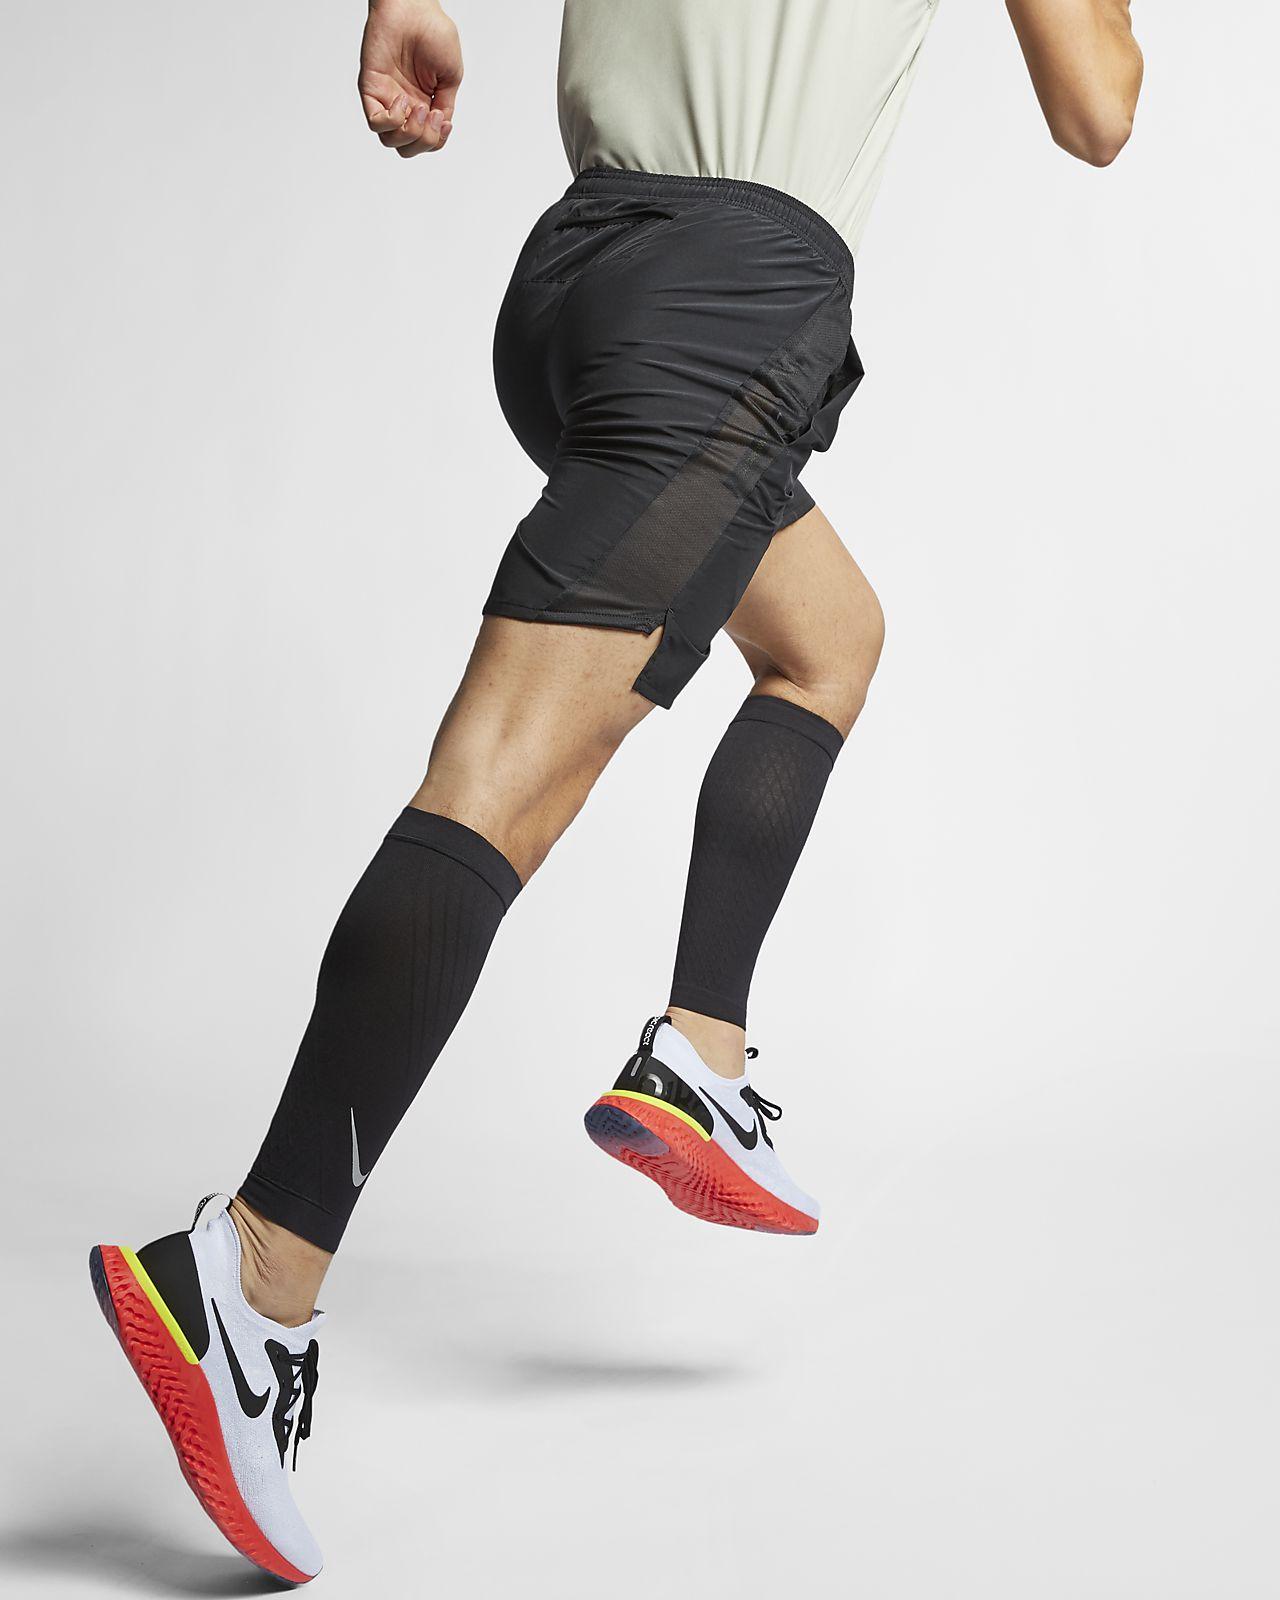 d83f703078e Low Resolution Nike Challenger Men s Running Shorts Nike Challenger Men s  Running Shorts